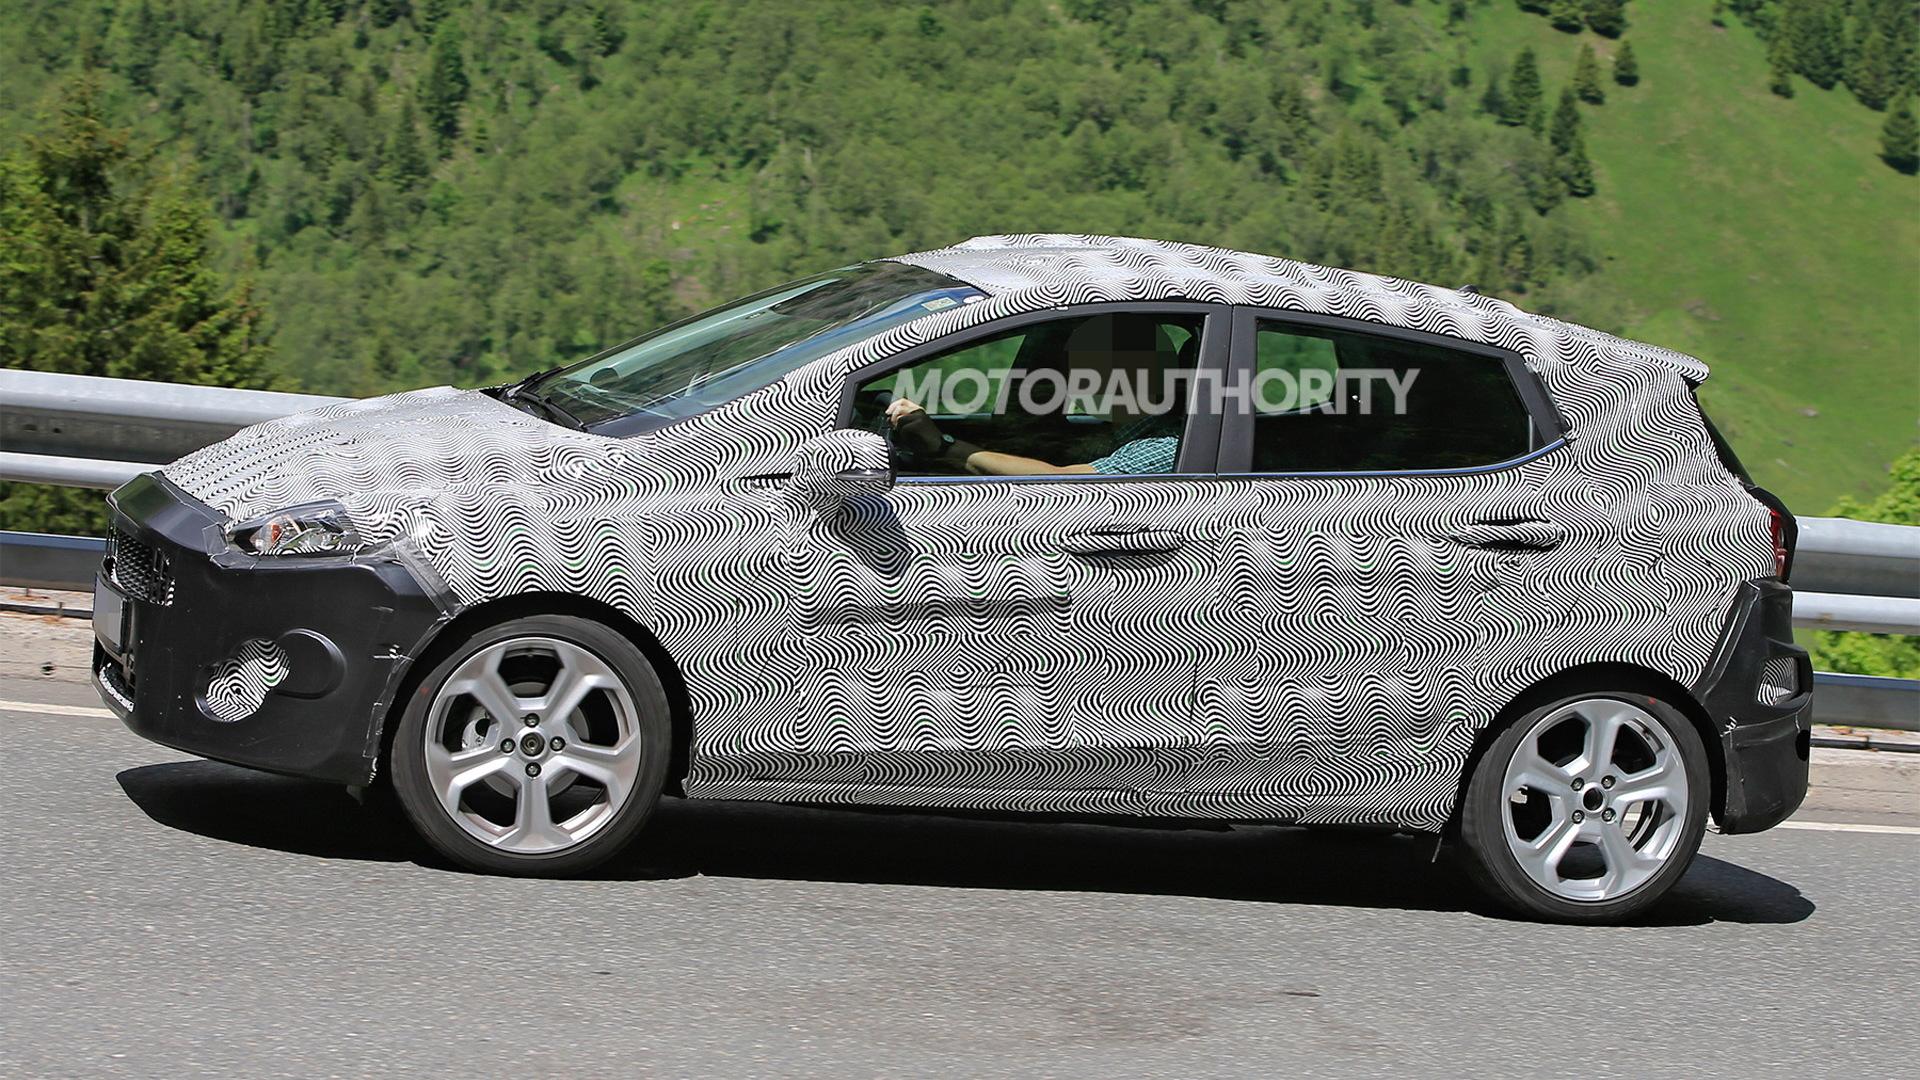 2018 Ford Fiesta spy shots - Image via S. Baldauf/SB-Median